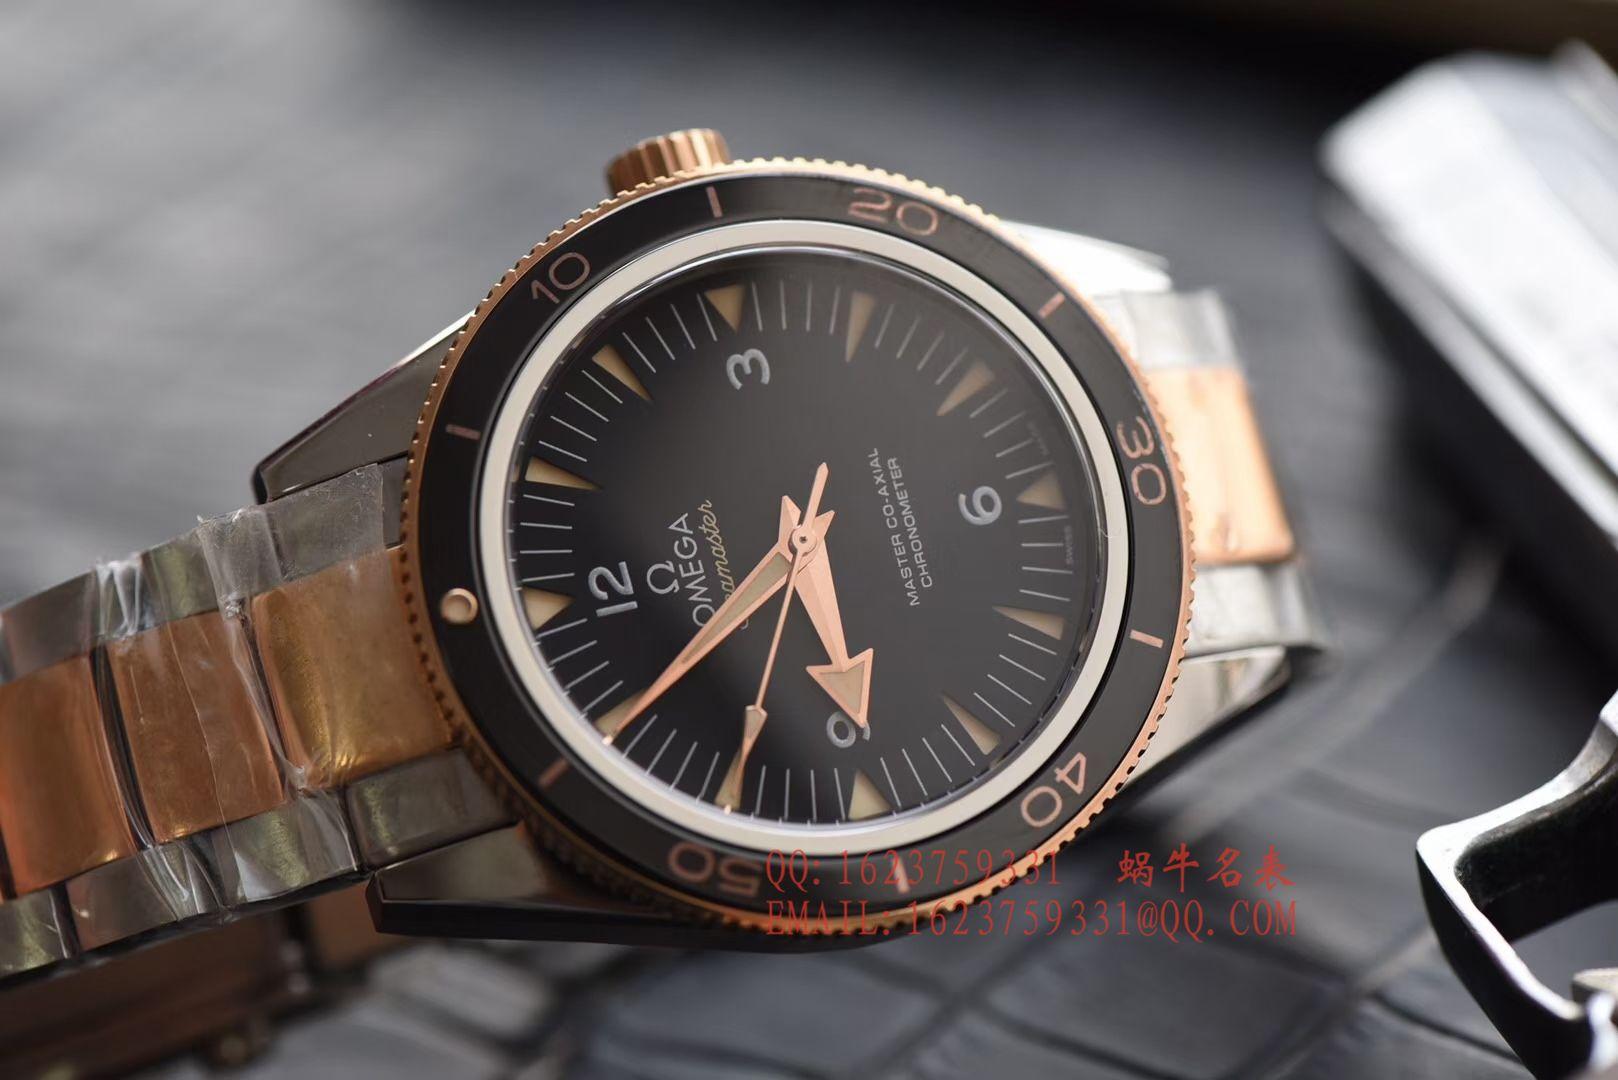 【XF一比一超A高仿手表】欧米茄 海马300系列233.60.41.21.01.001腕表 / MAH185